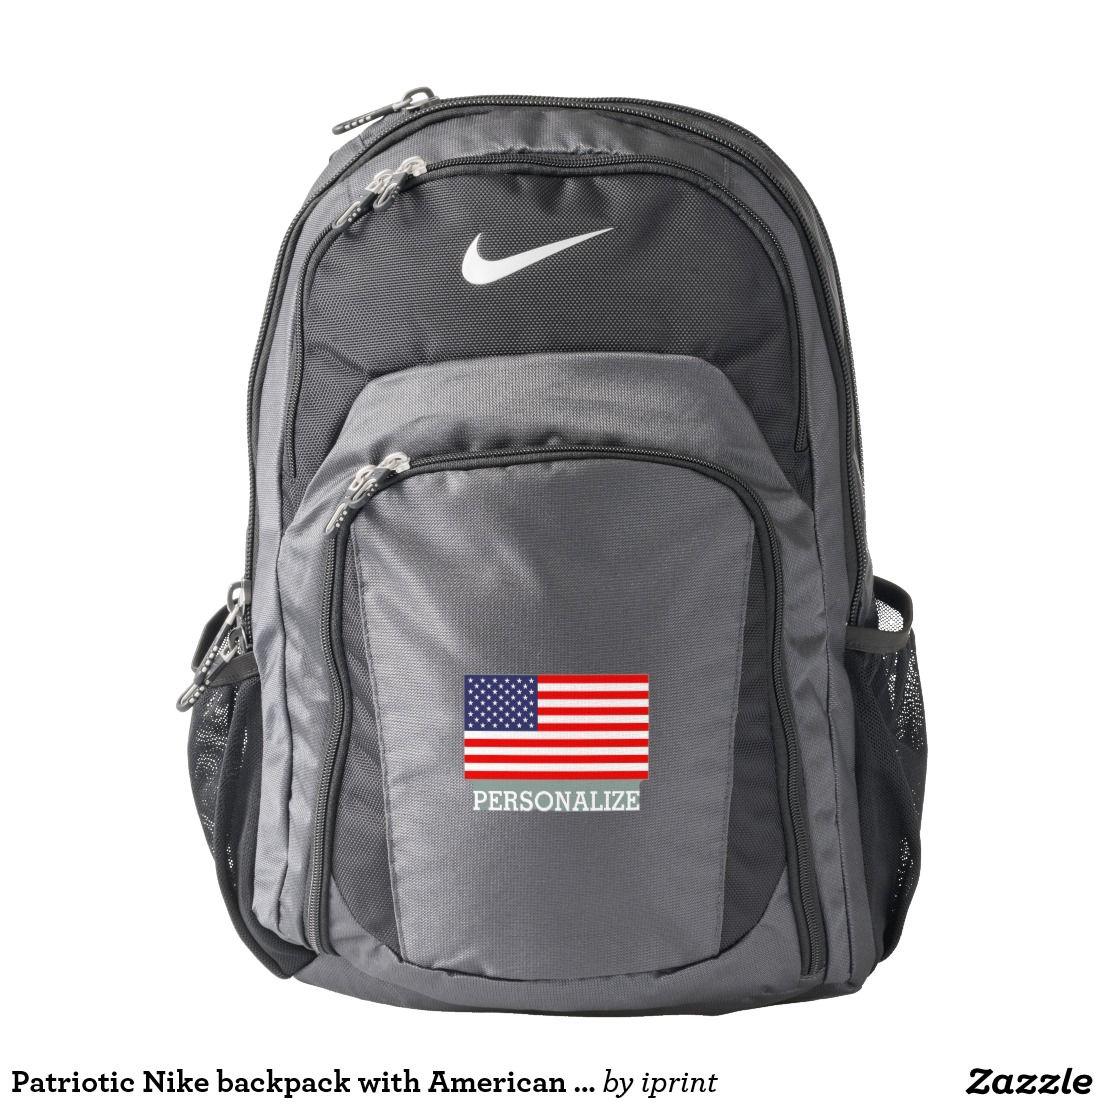 53ce4adb48ba Patriotic Nike backpack with American flag | Zazzle.com | Backpacks ...